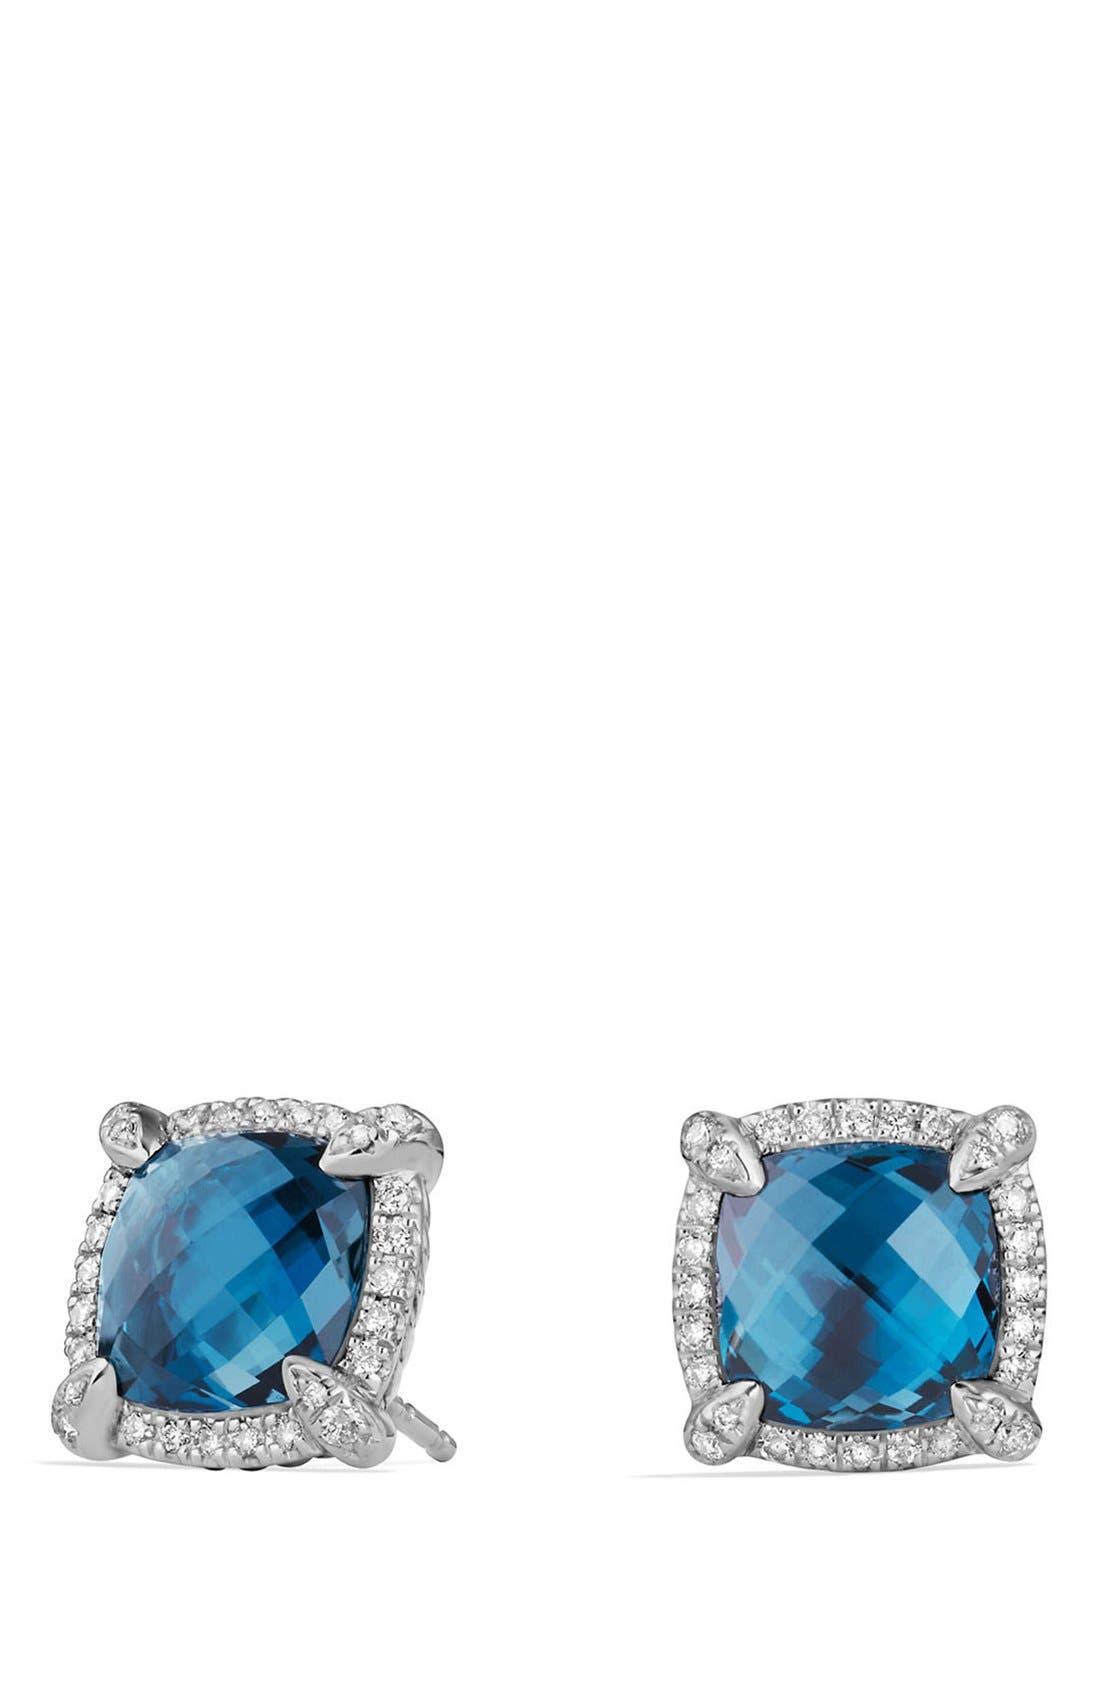 Main Image - David Yurman 'Châtelaine' Pavé Bezel Stud Earrings with Diamonds